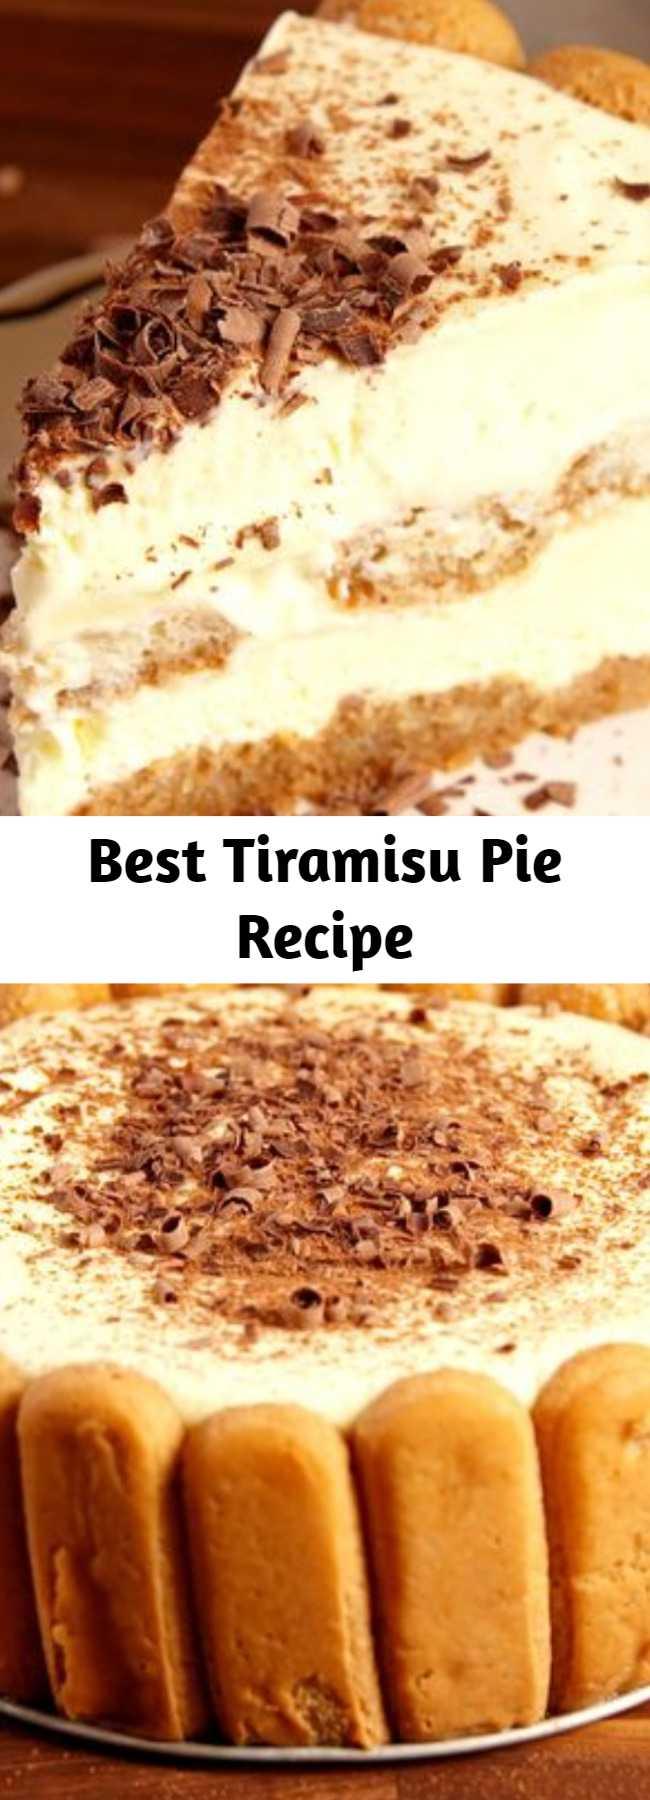 Best Tiramisu Pie Recipe - Looking for a tiramisu dessert? This Tiramisu Pie is the best. Tiramisu pie > regular tiramisu.